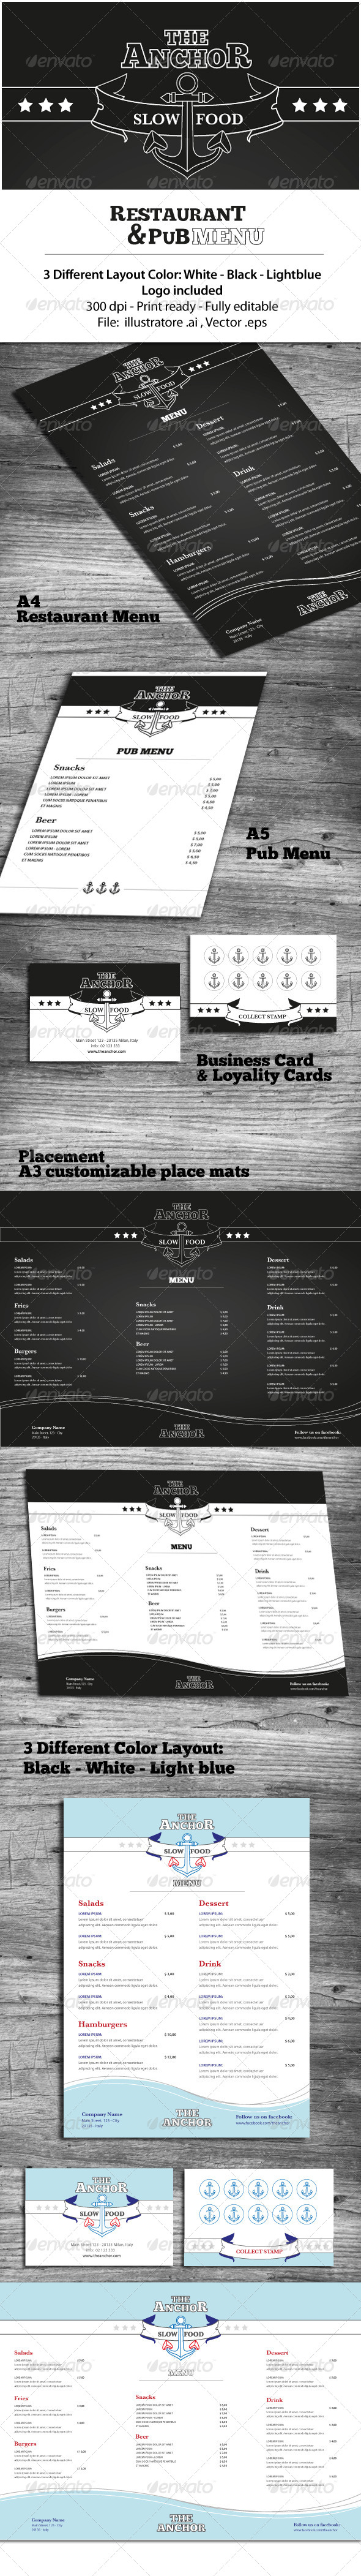 Restaurant & Pub Menu